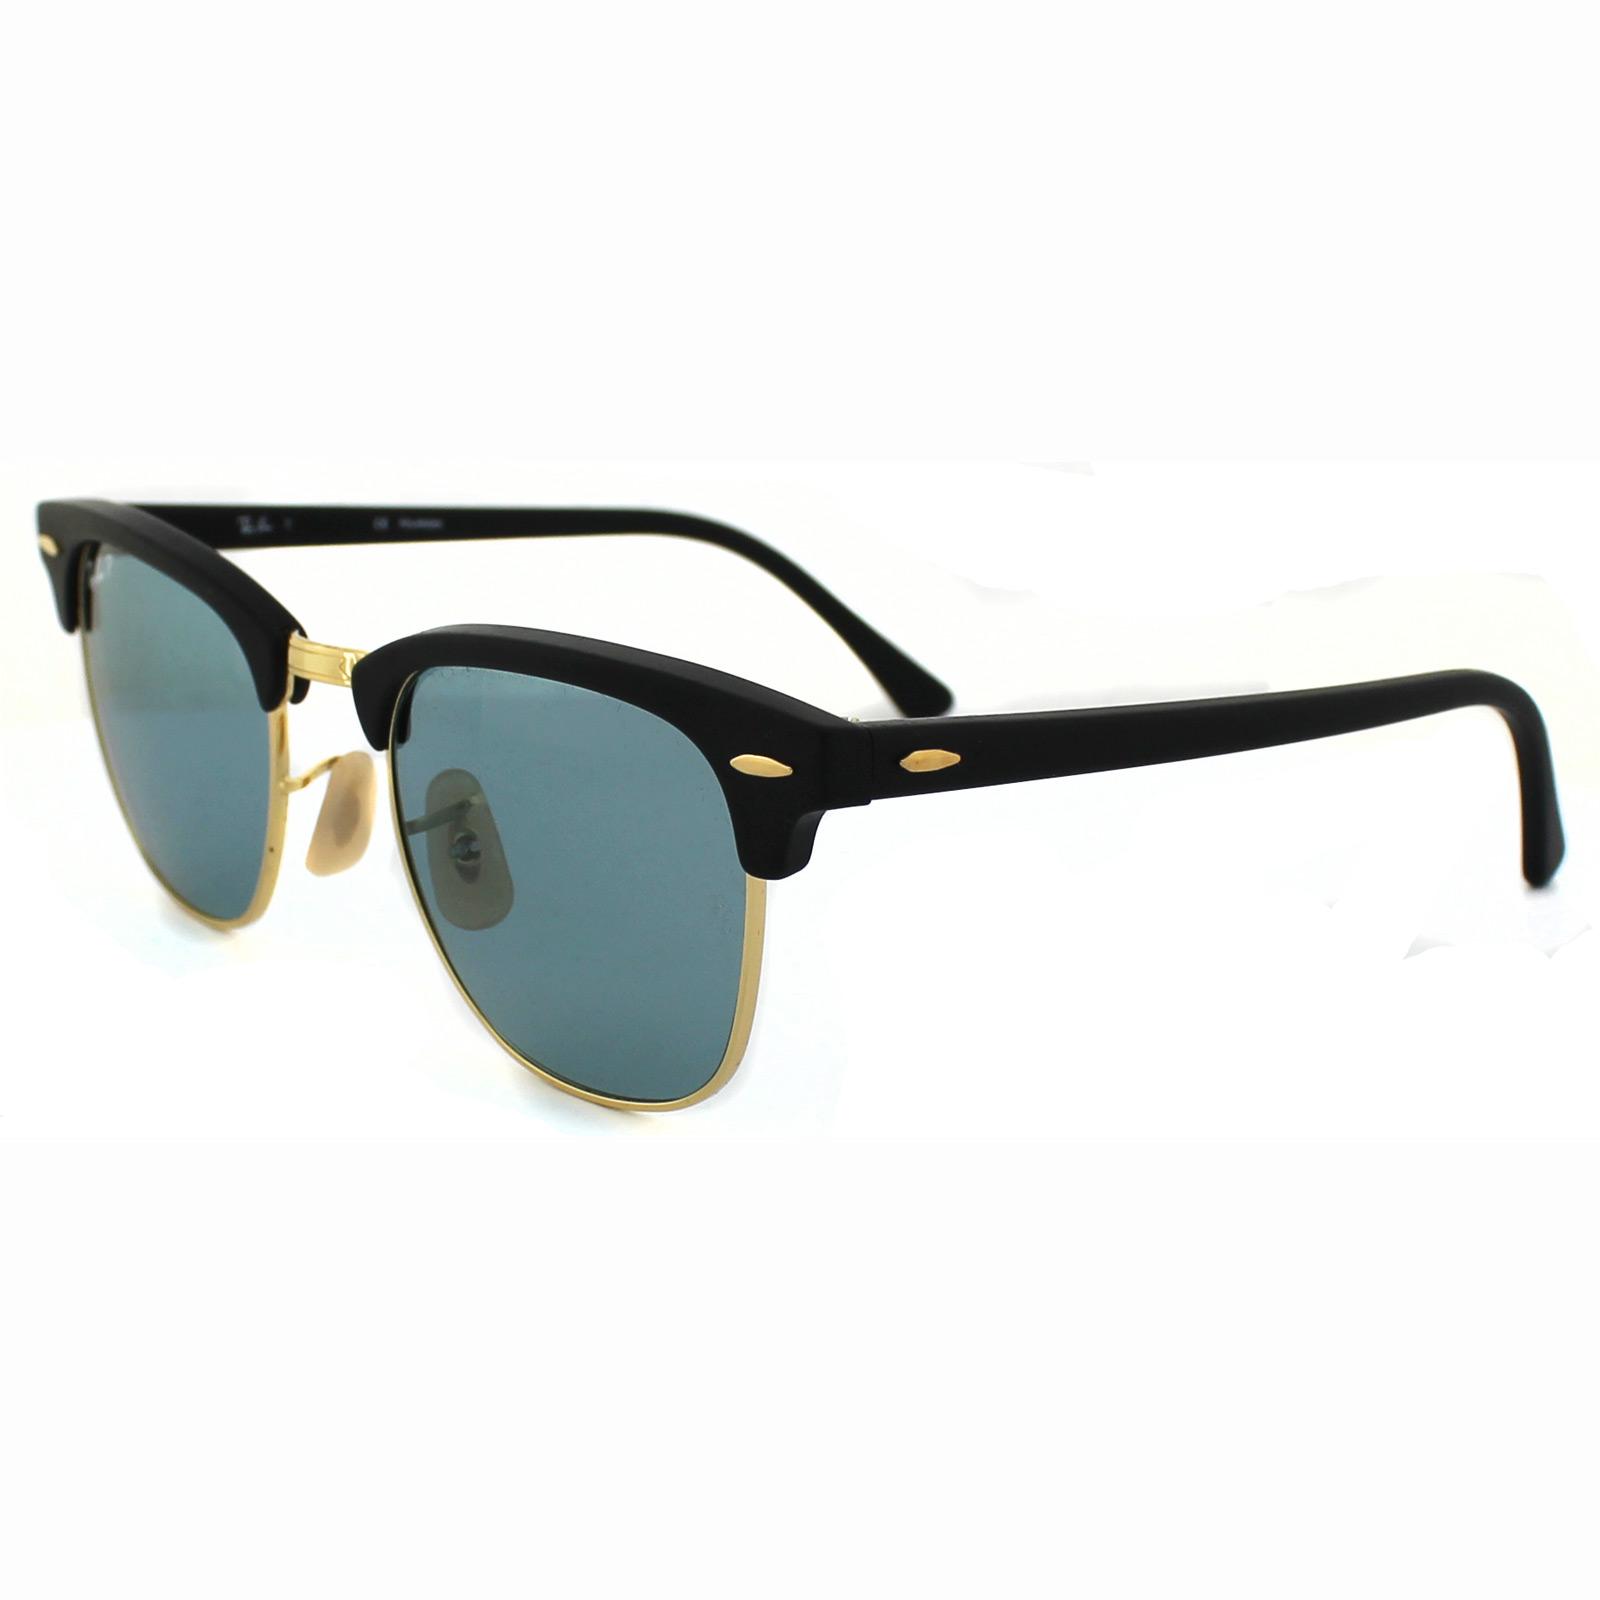 9b3cdac3aa Ray Ban Clubmaster 3016 Polarized Aviator Sunglasses « Heritage Malta